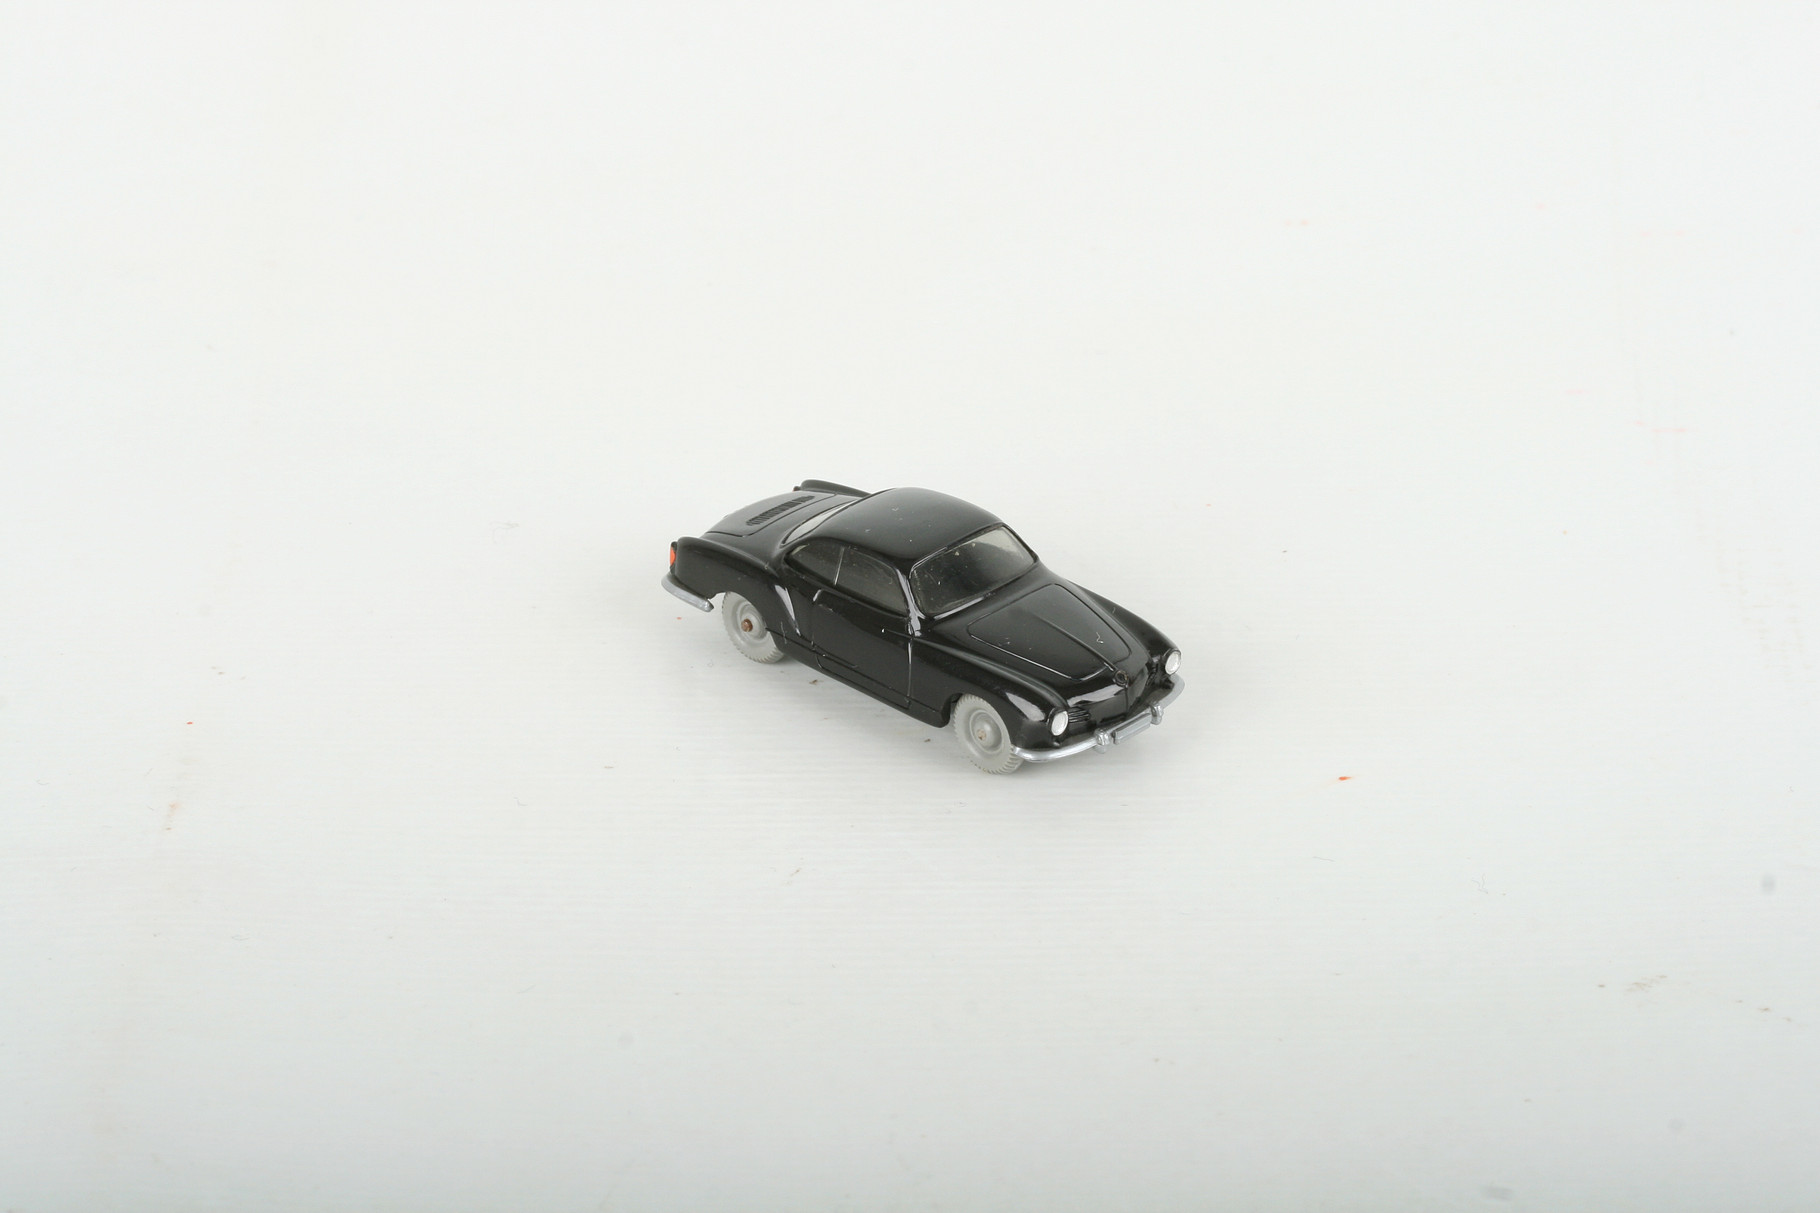 Wiking VW Karmann Ghia schwarz - ZUSCHLAG Auktionshaus Wrede 750,– Euro